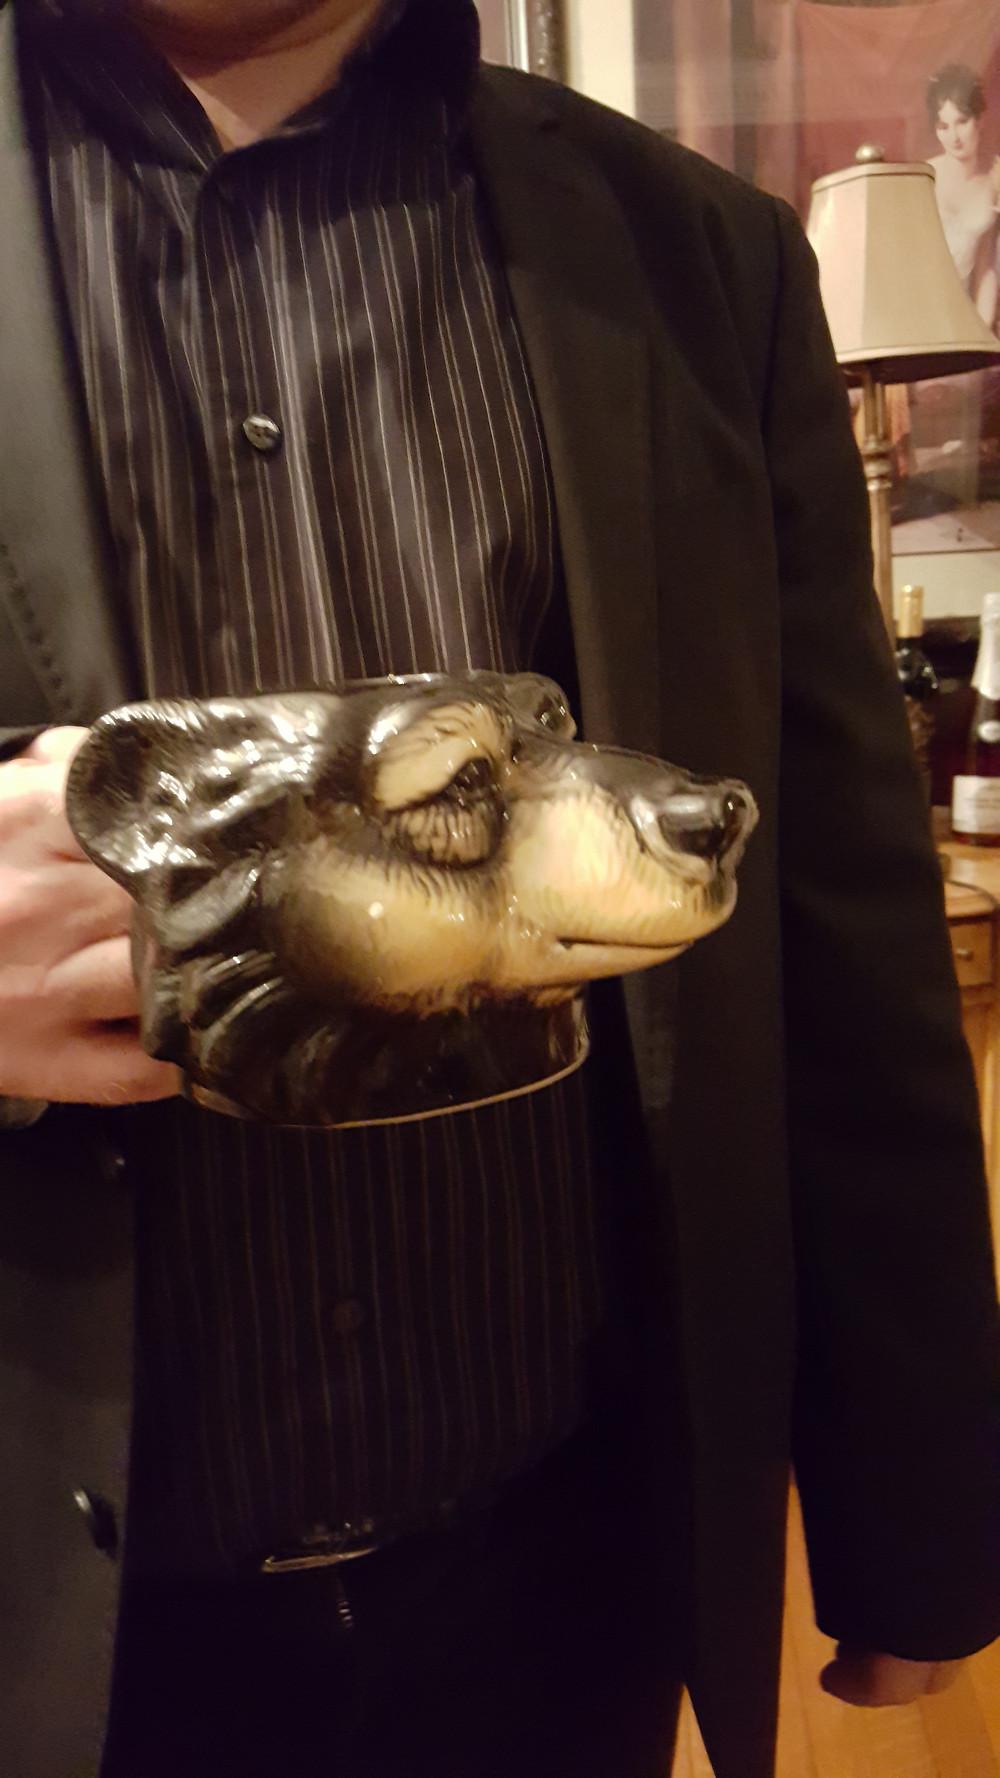 wolf mug closeup